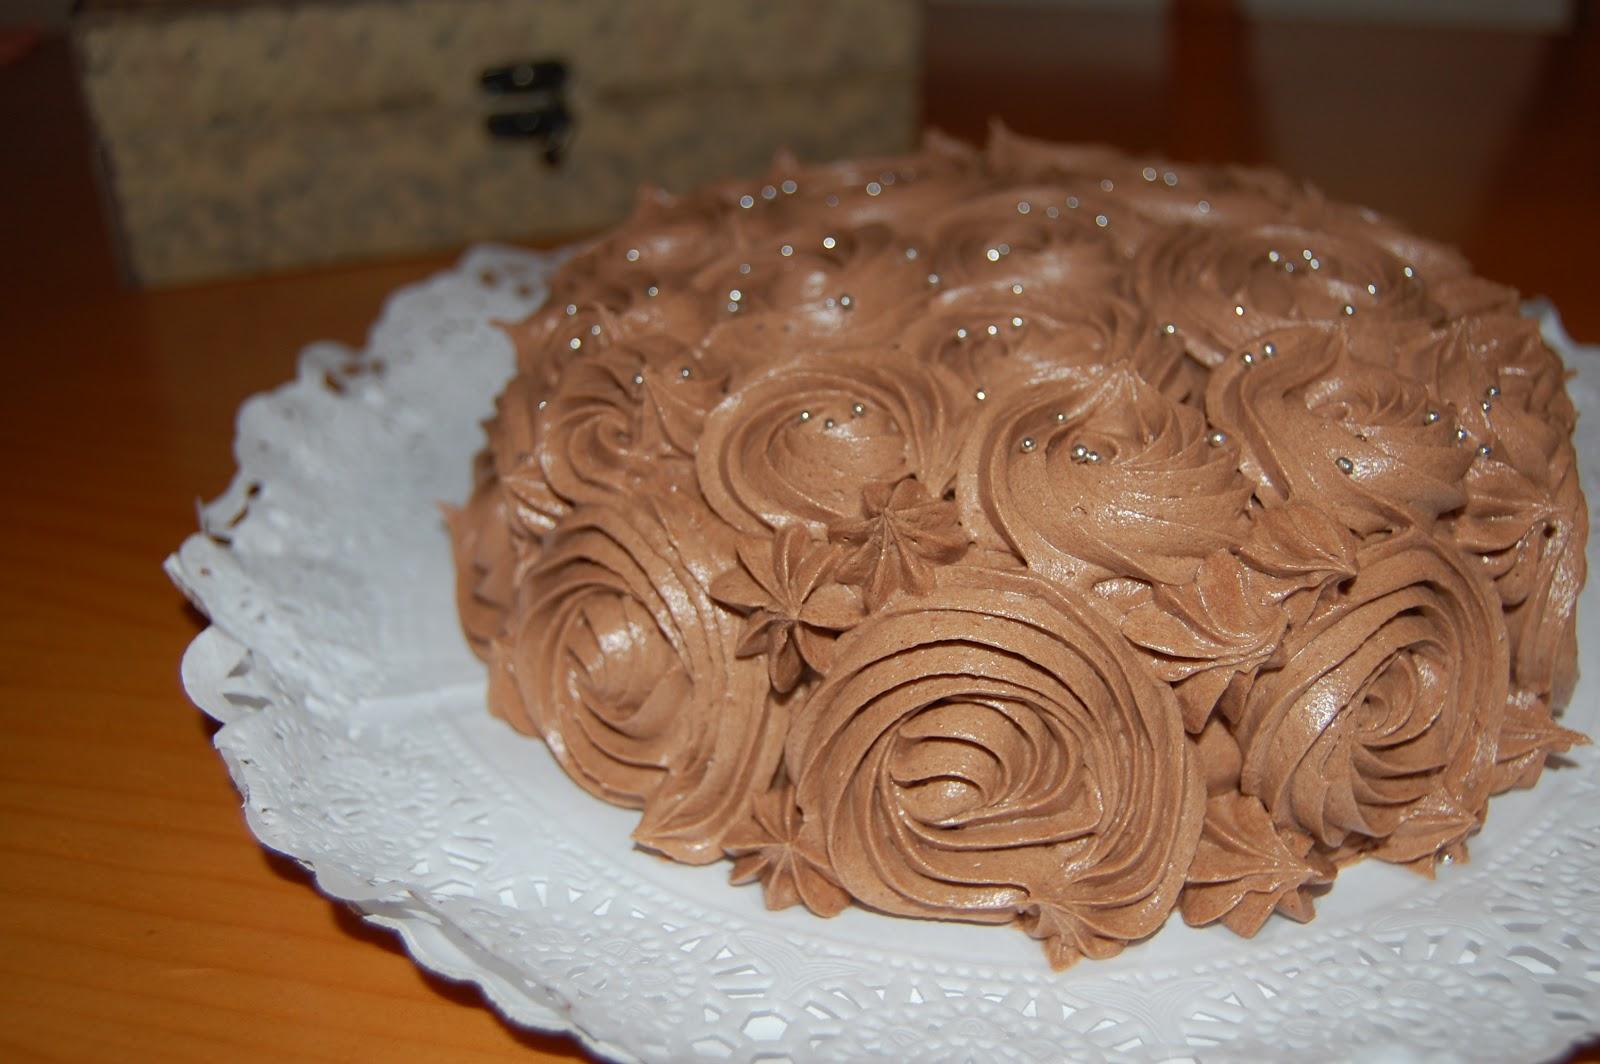 http://azucarenmicocina.blogspot.com.es/2012/10/tarta-de-rosas-para-blanca.html